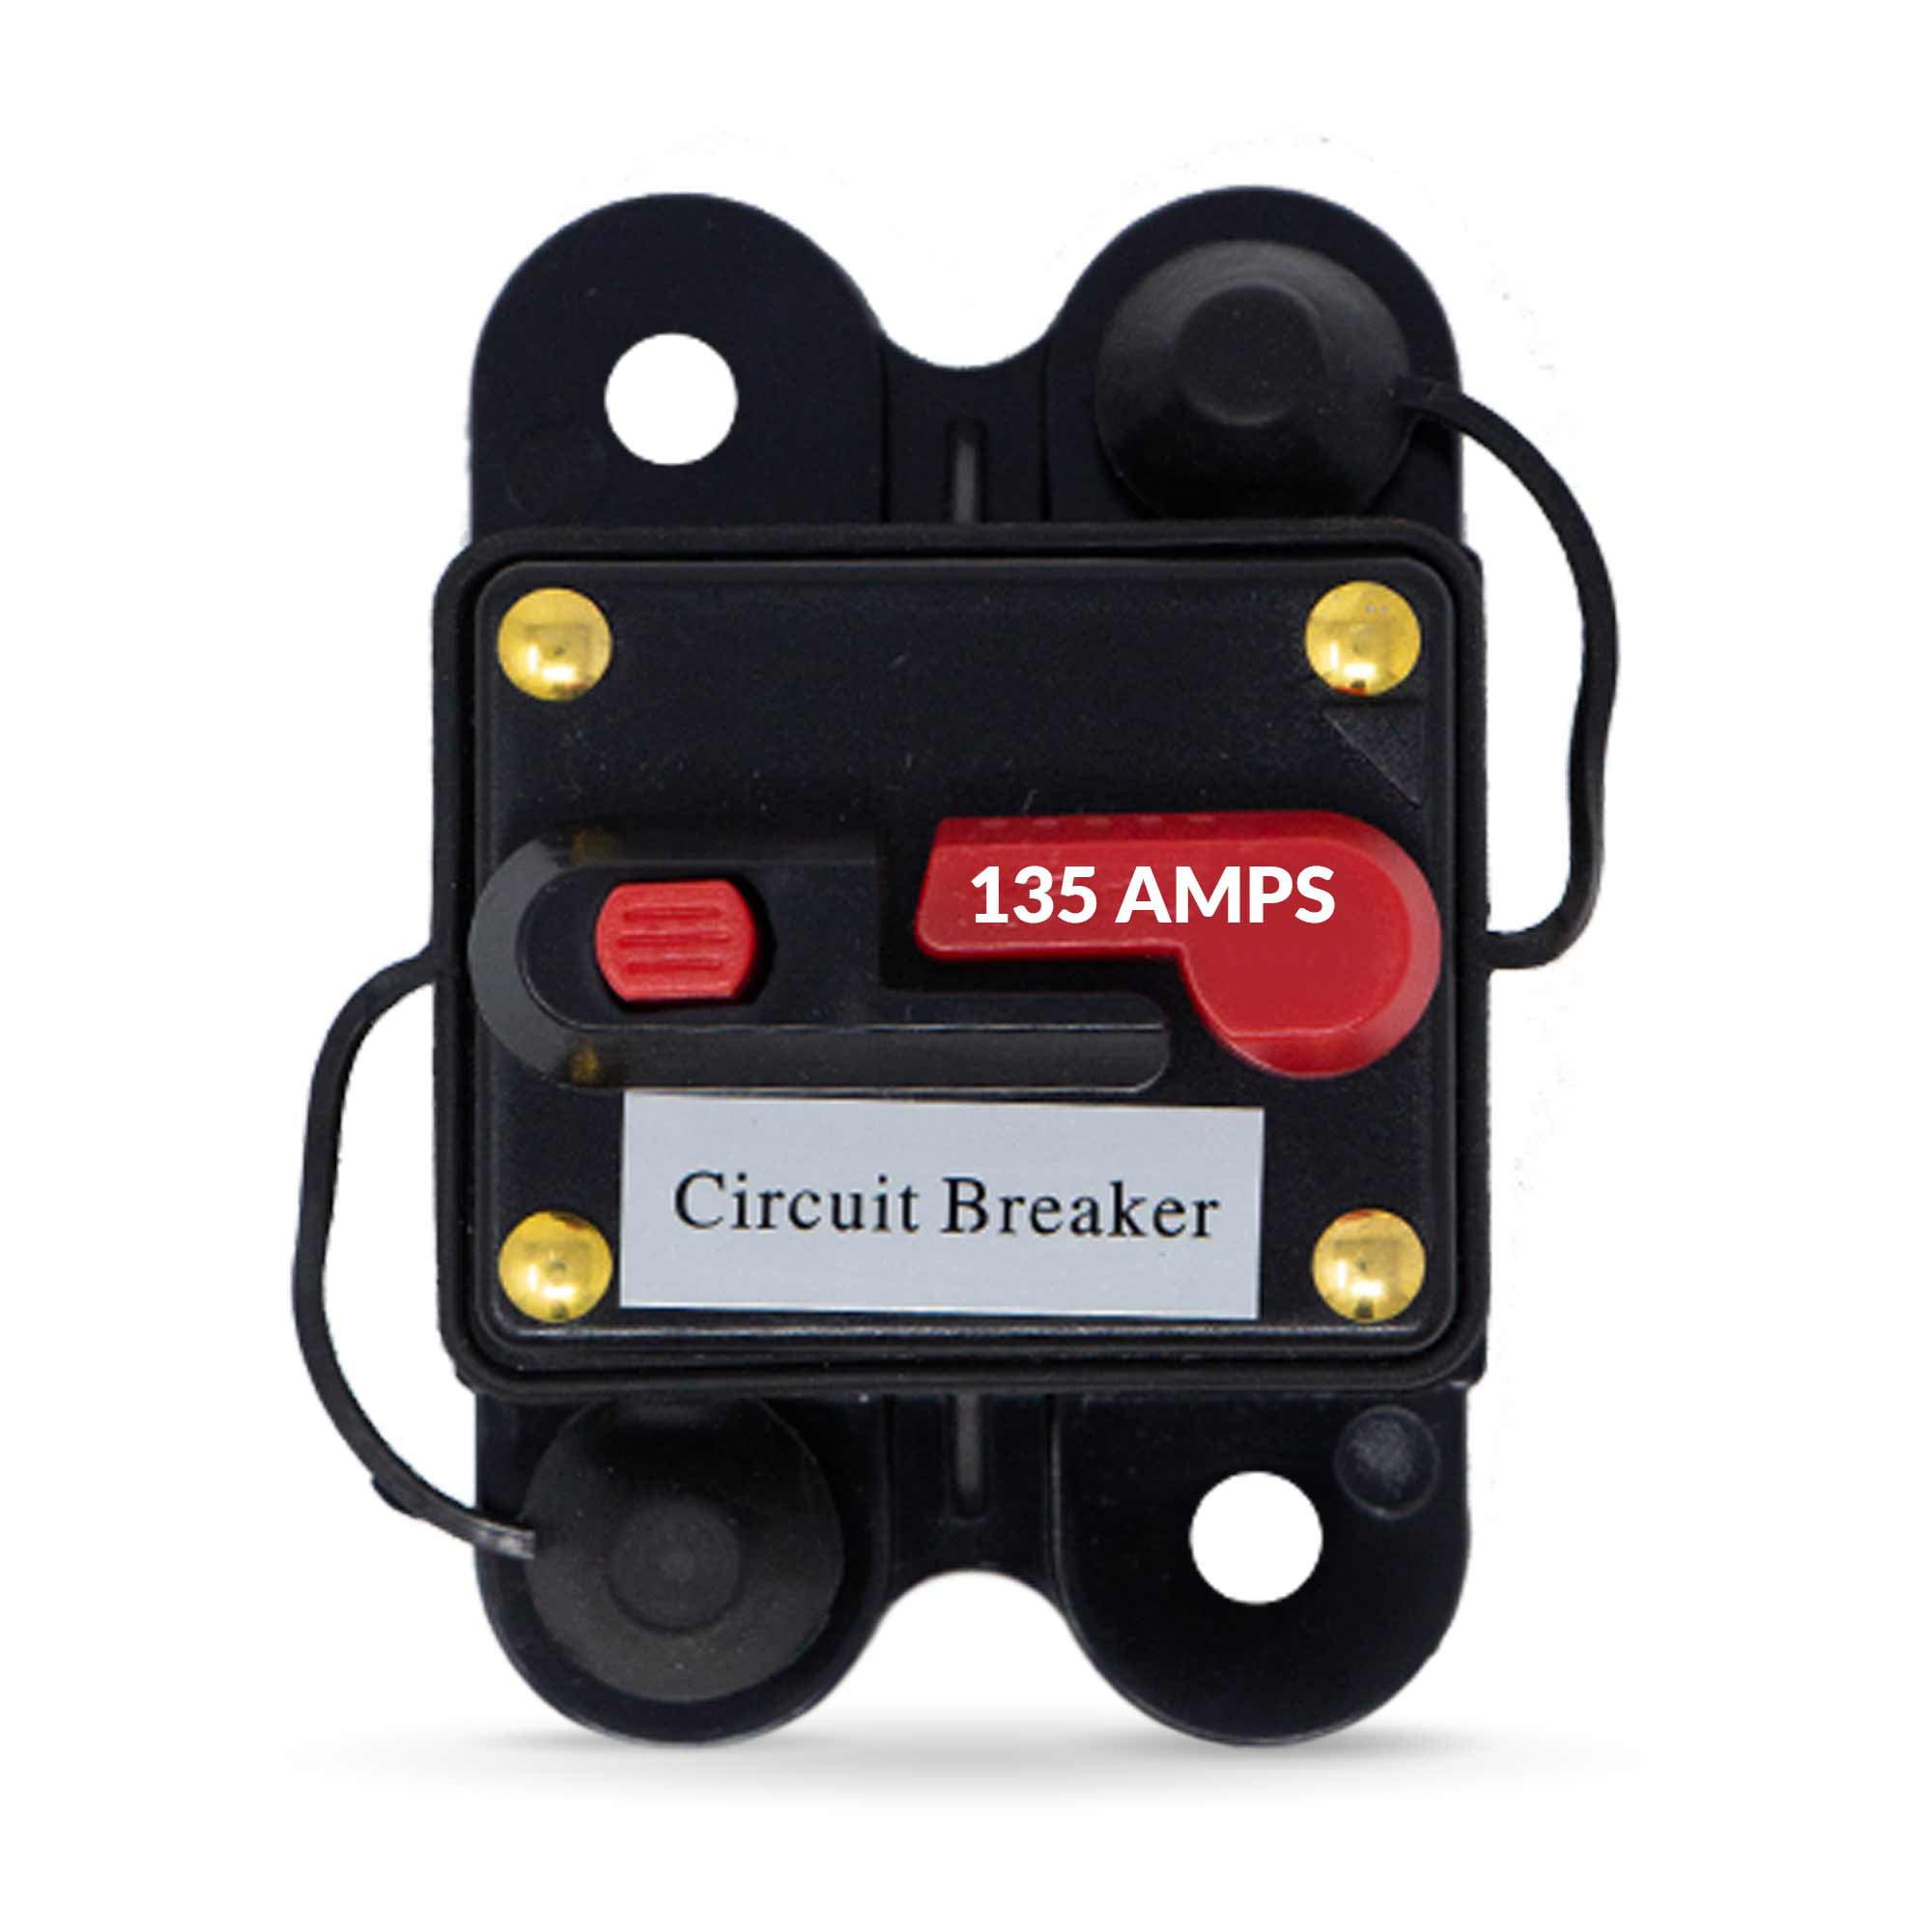 Five Oceans Marine circuit breaker (135amp) for Anchor Windlass FO-3297